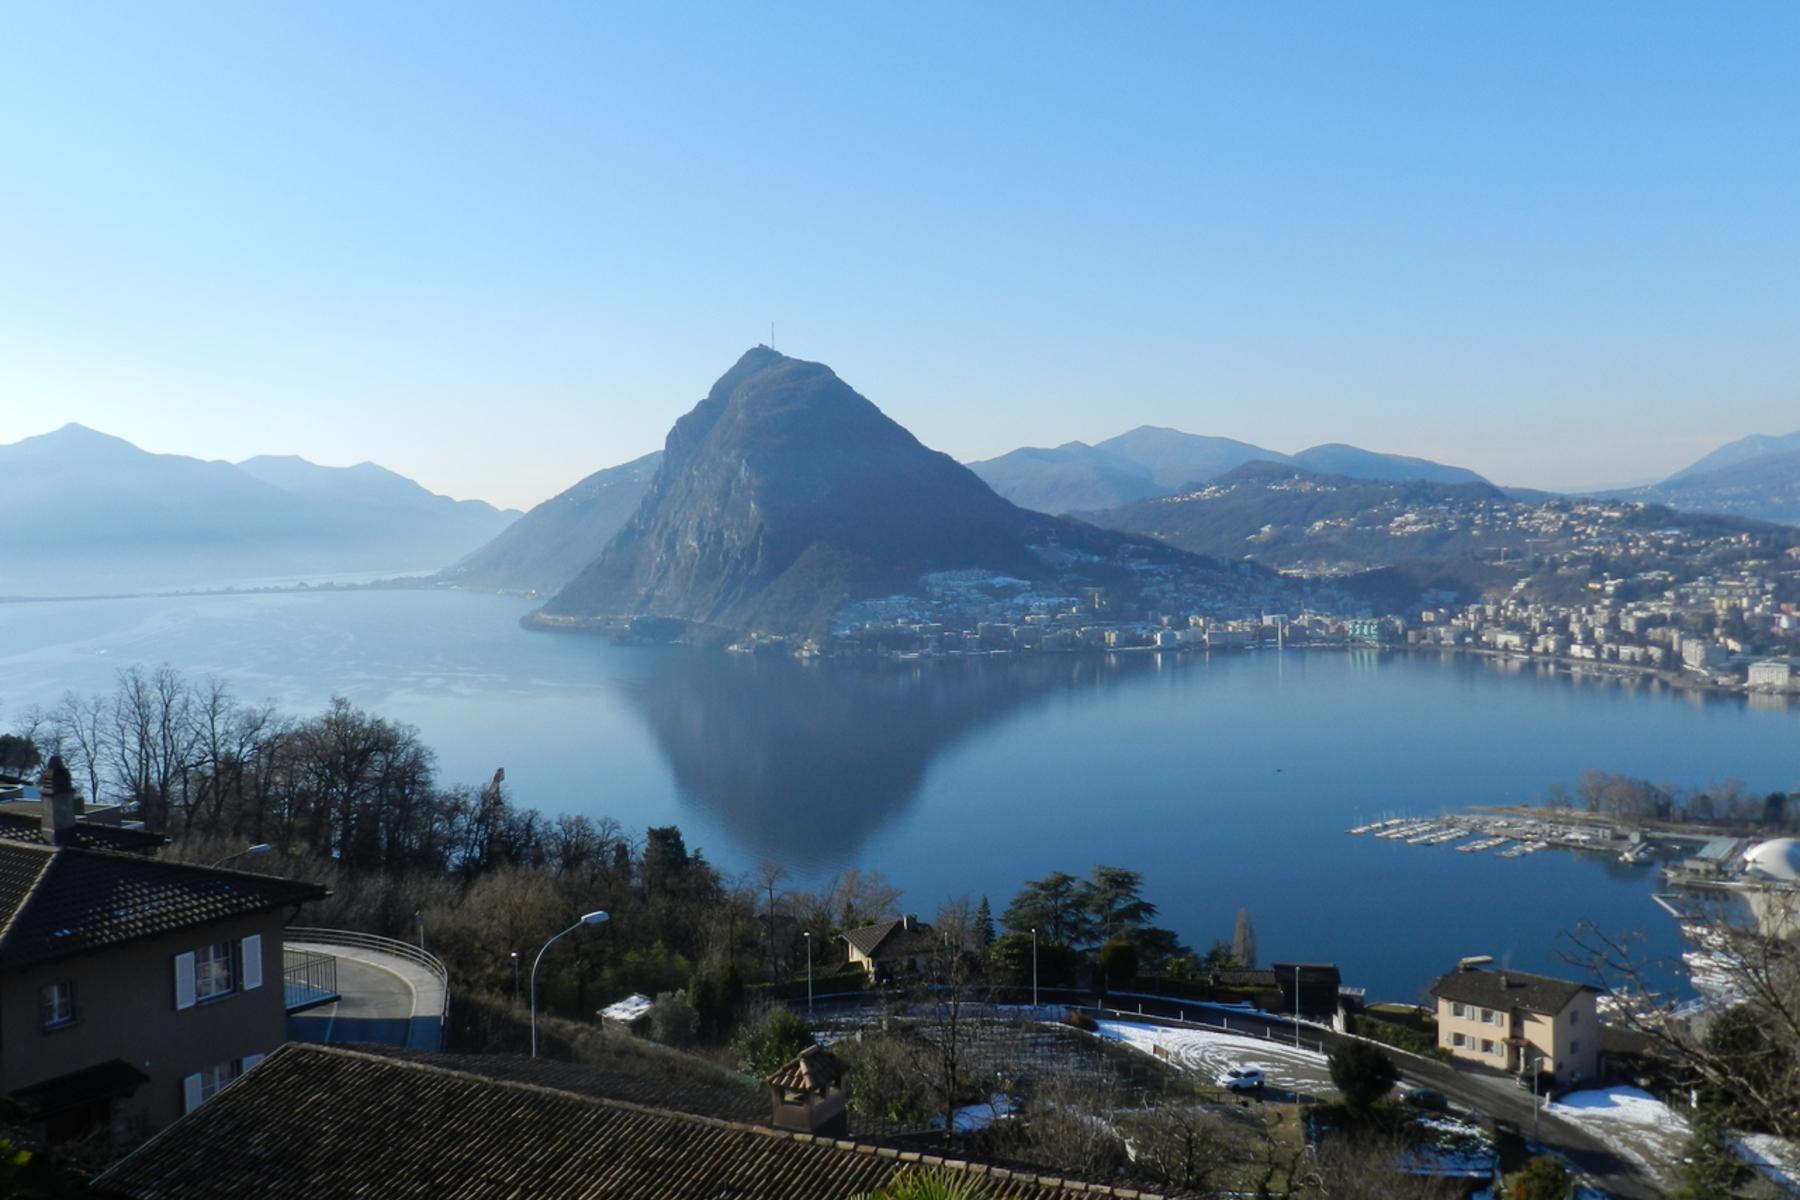 Terreno para Venda às Building plot with lake view Lugano, Aldesago, Ticino, 6974 Suíça